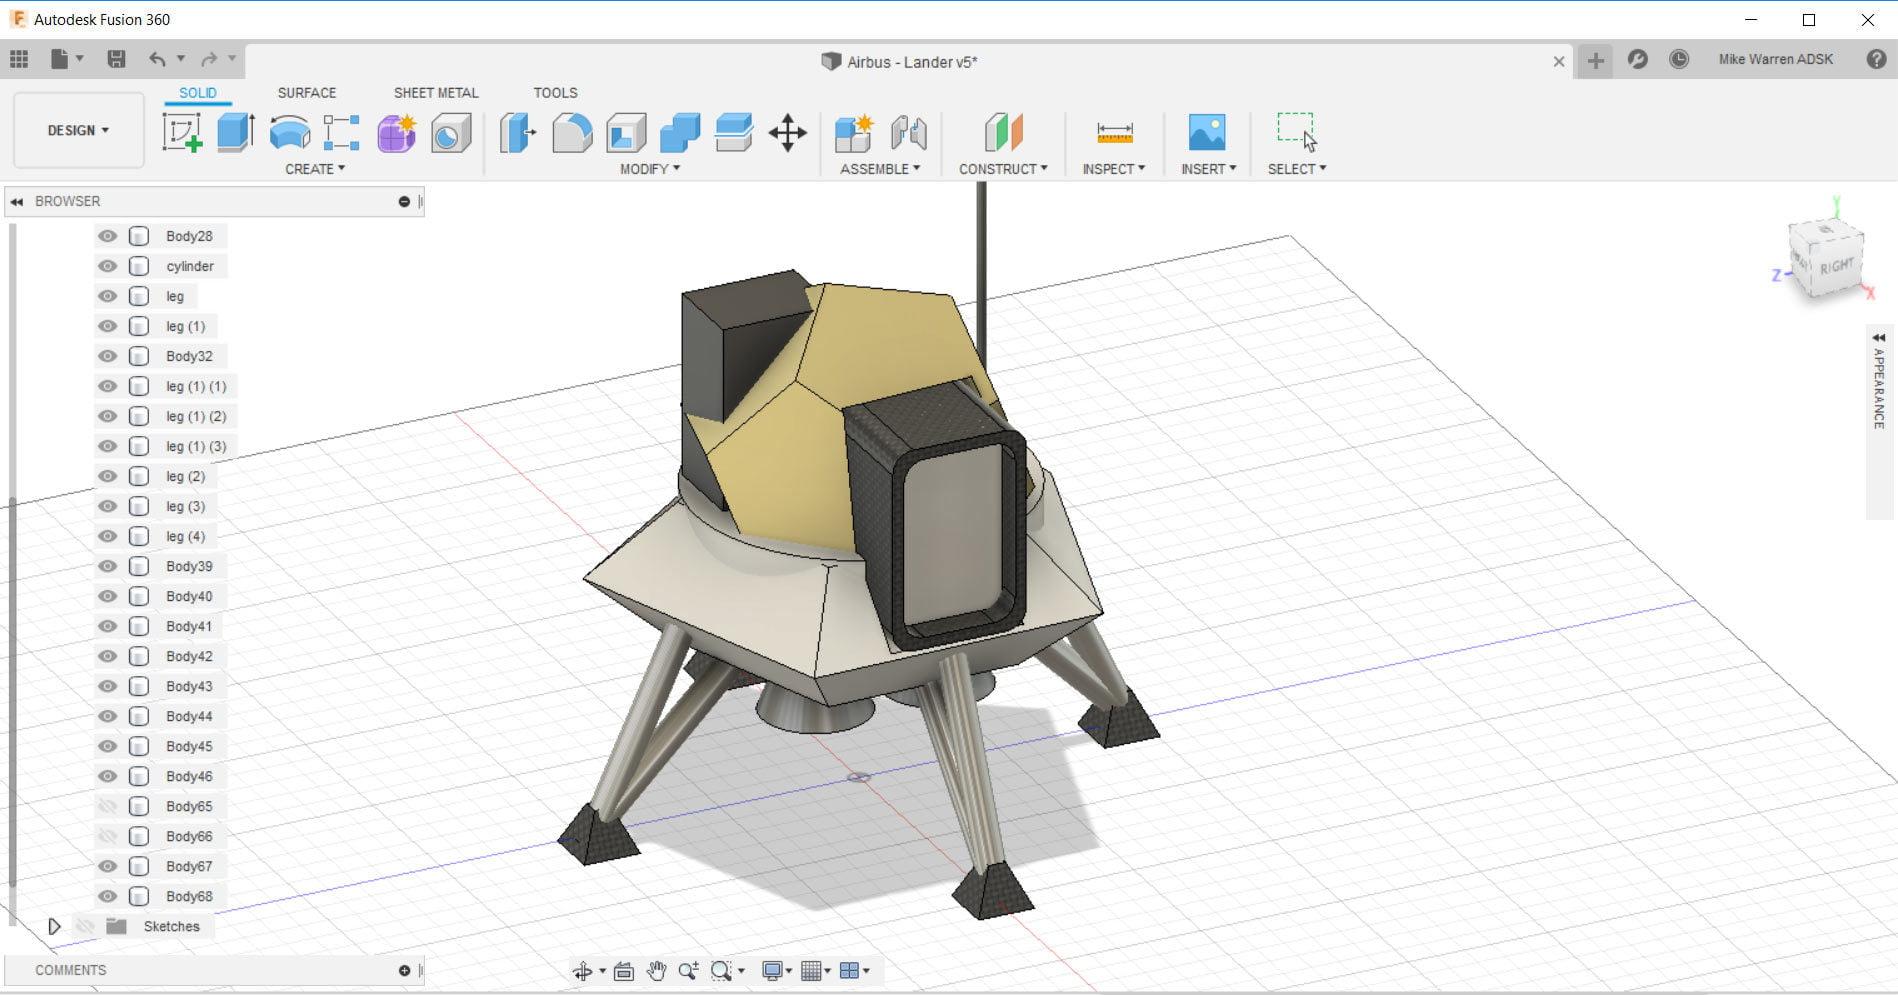 Design A Lunar Lander in Fusion 360